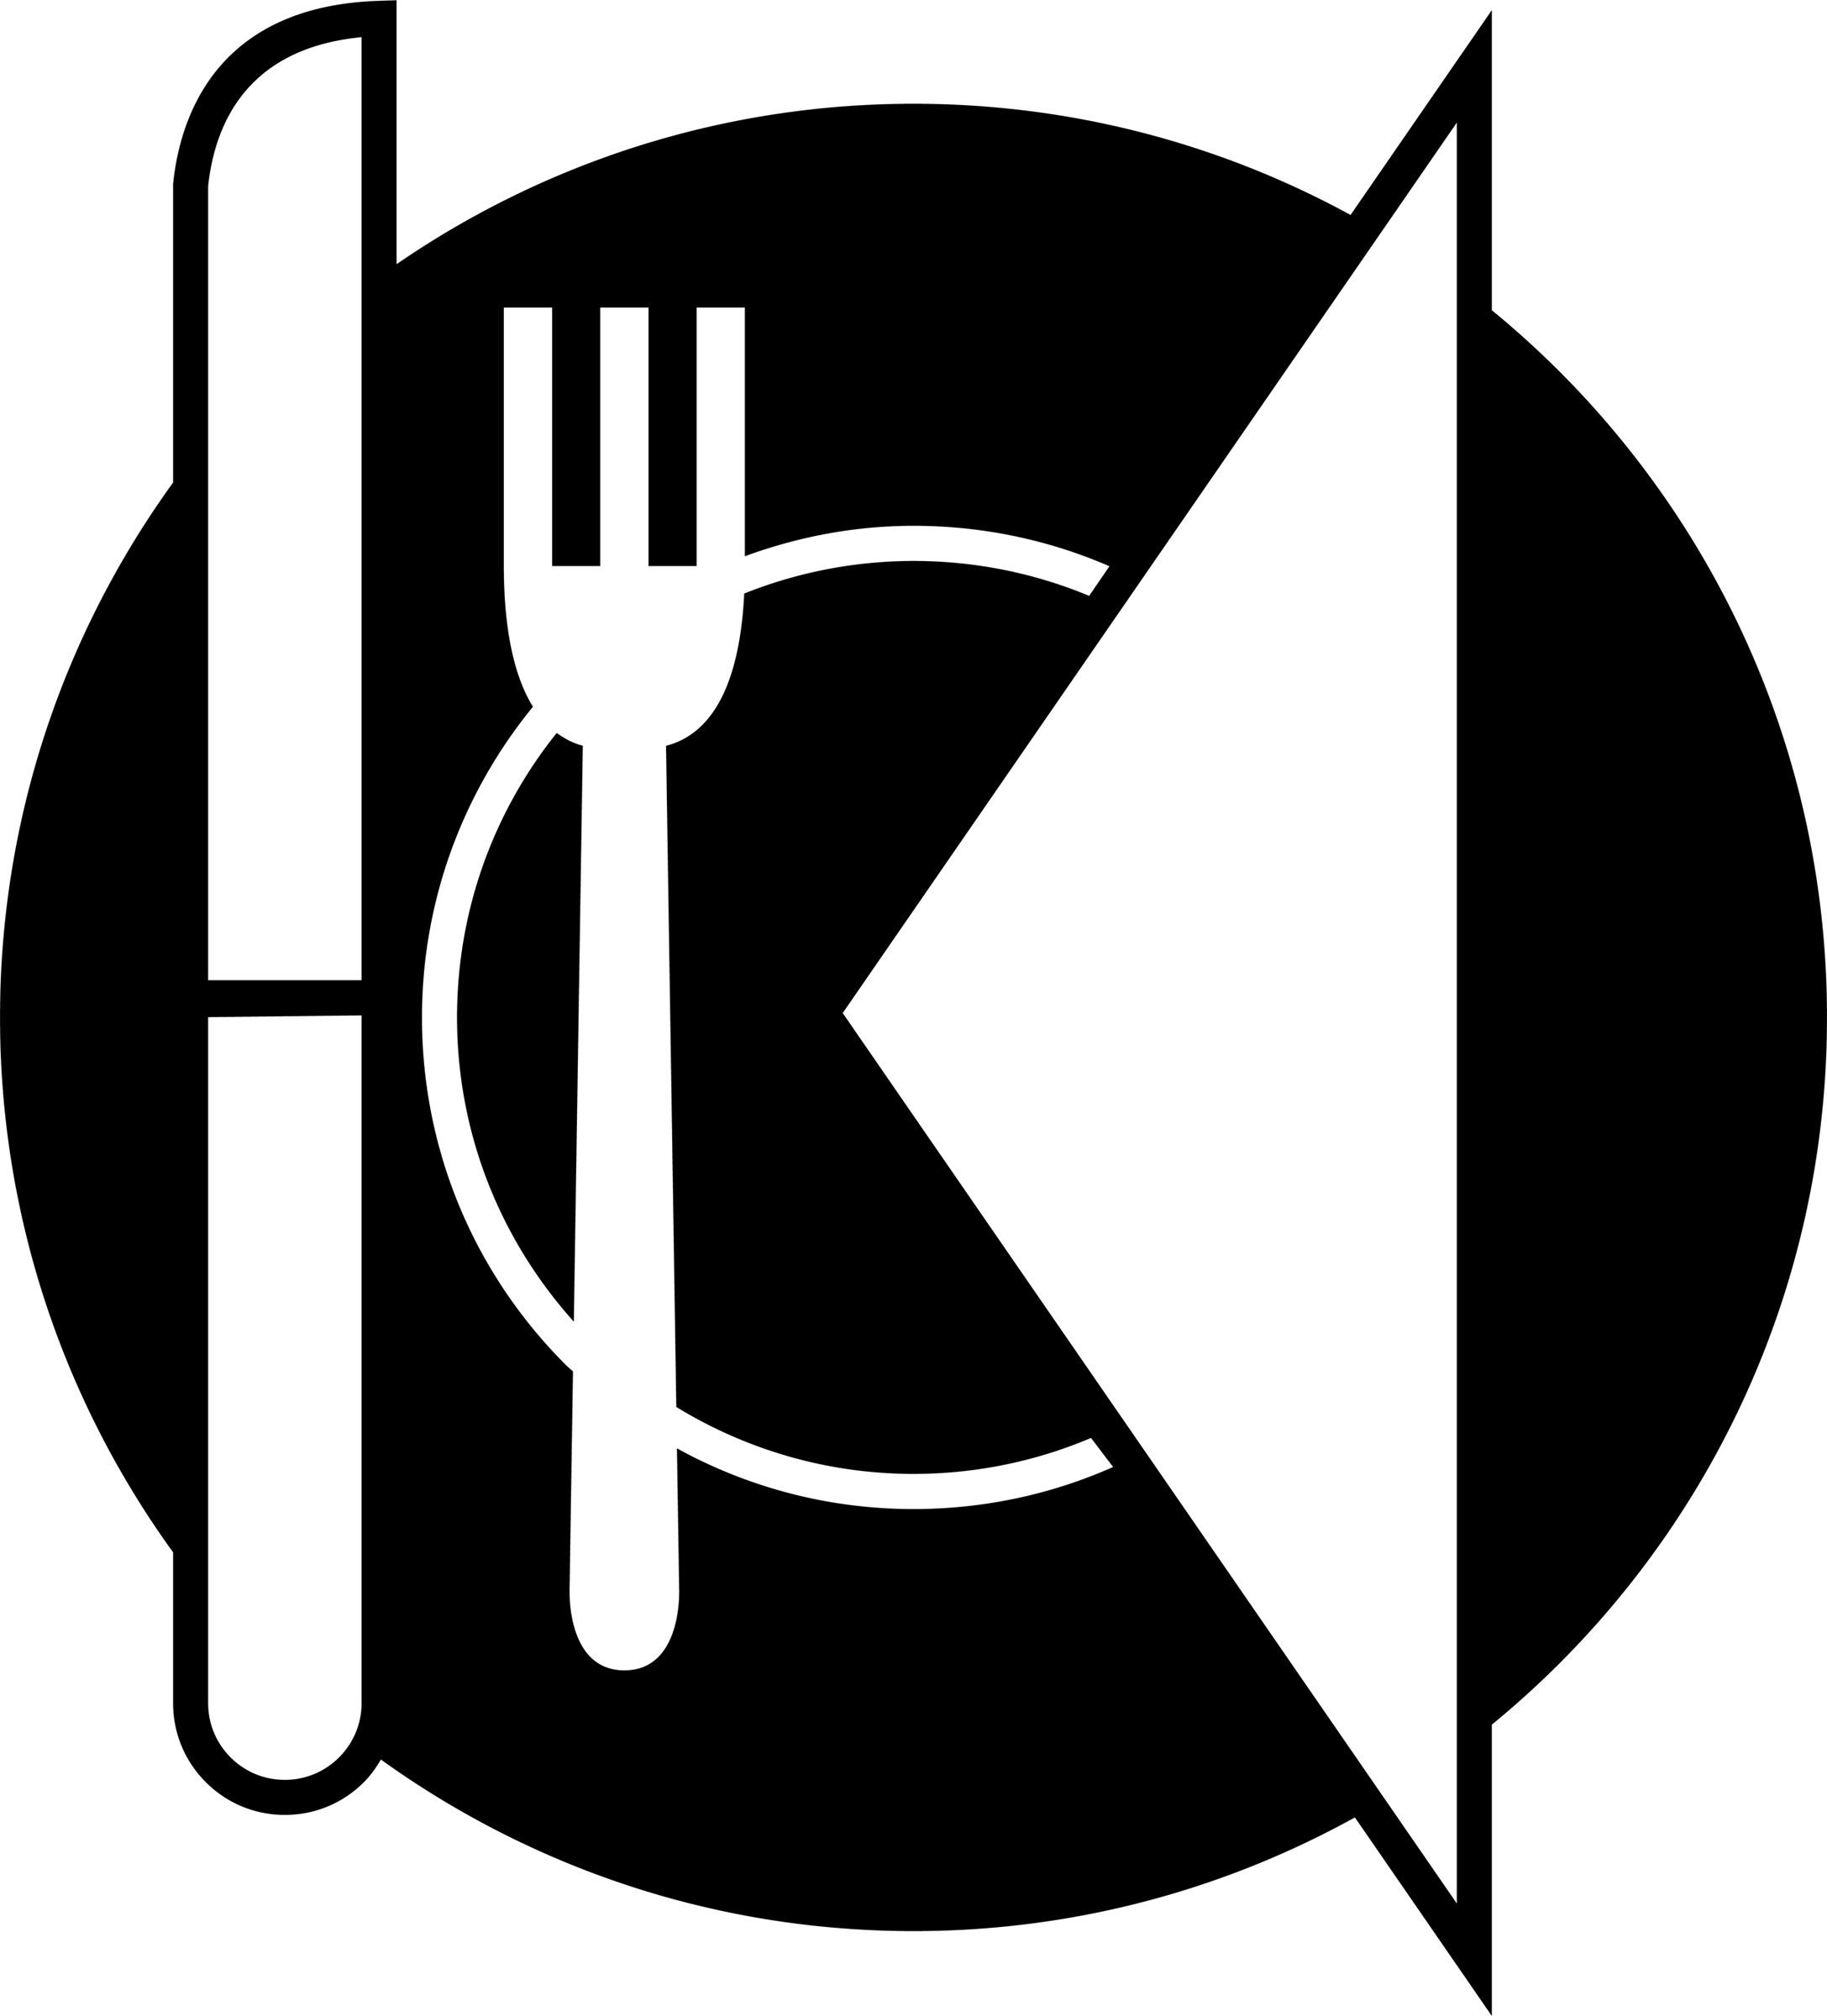 Dinner clipart black and white 2 » Clipart Portal.